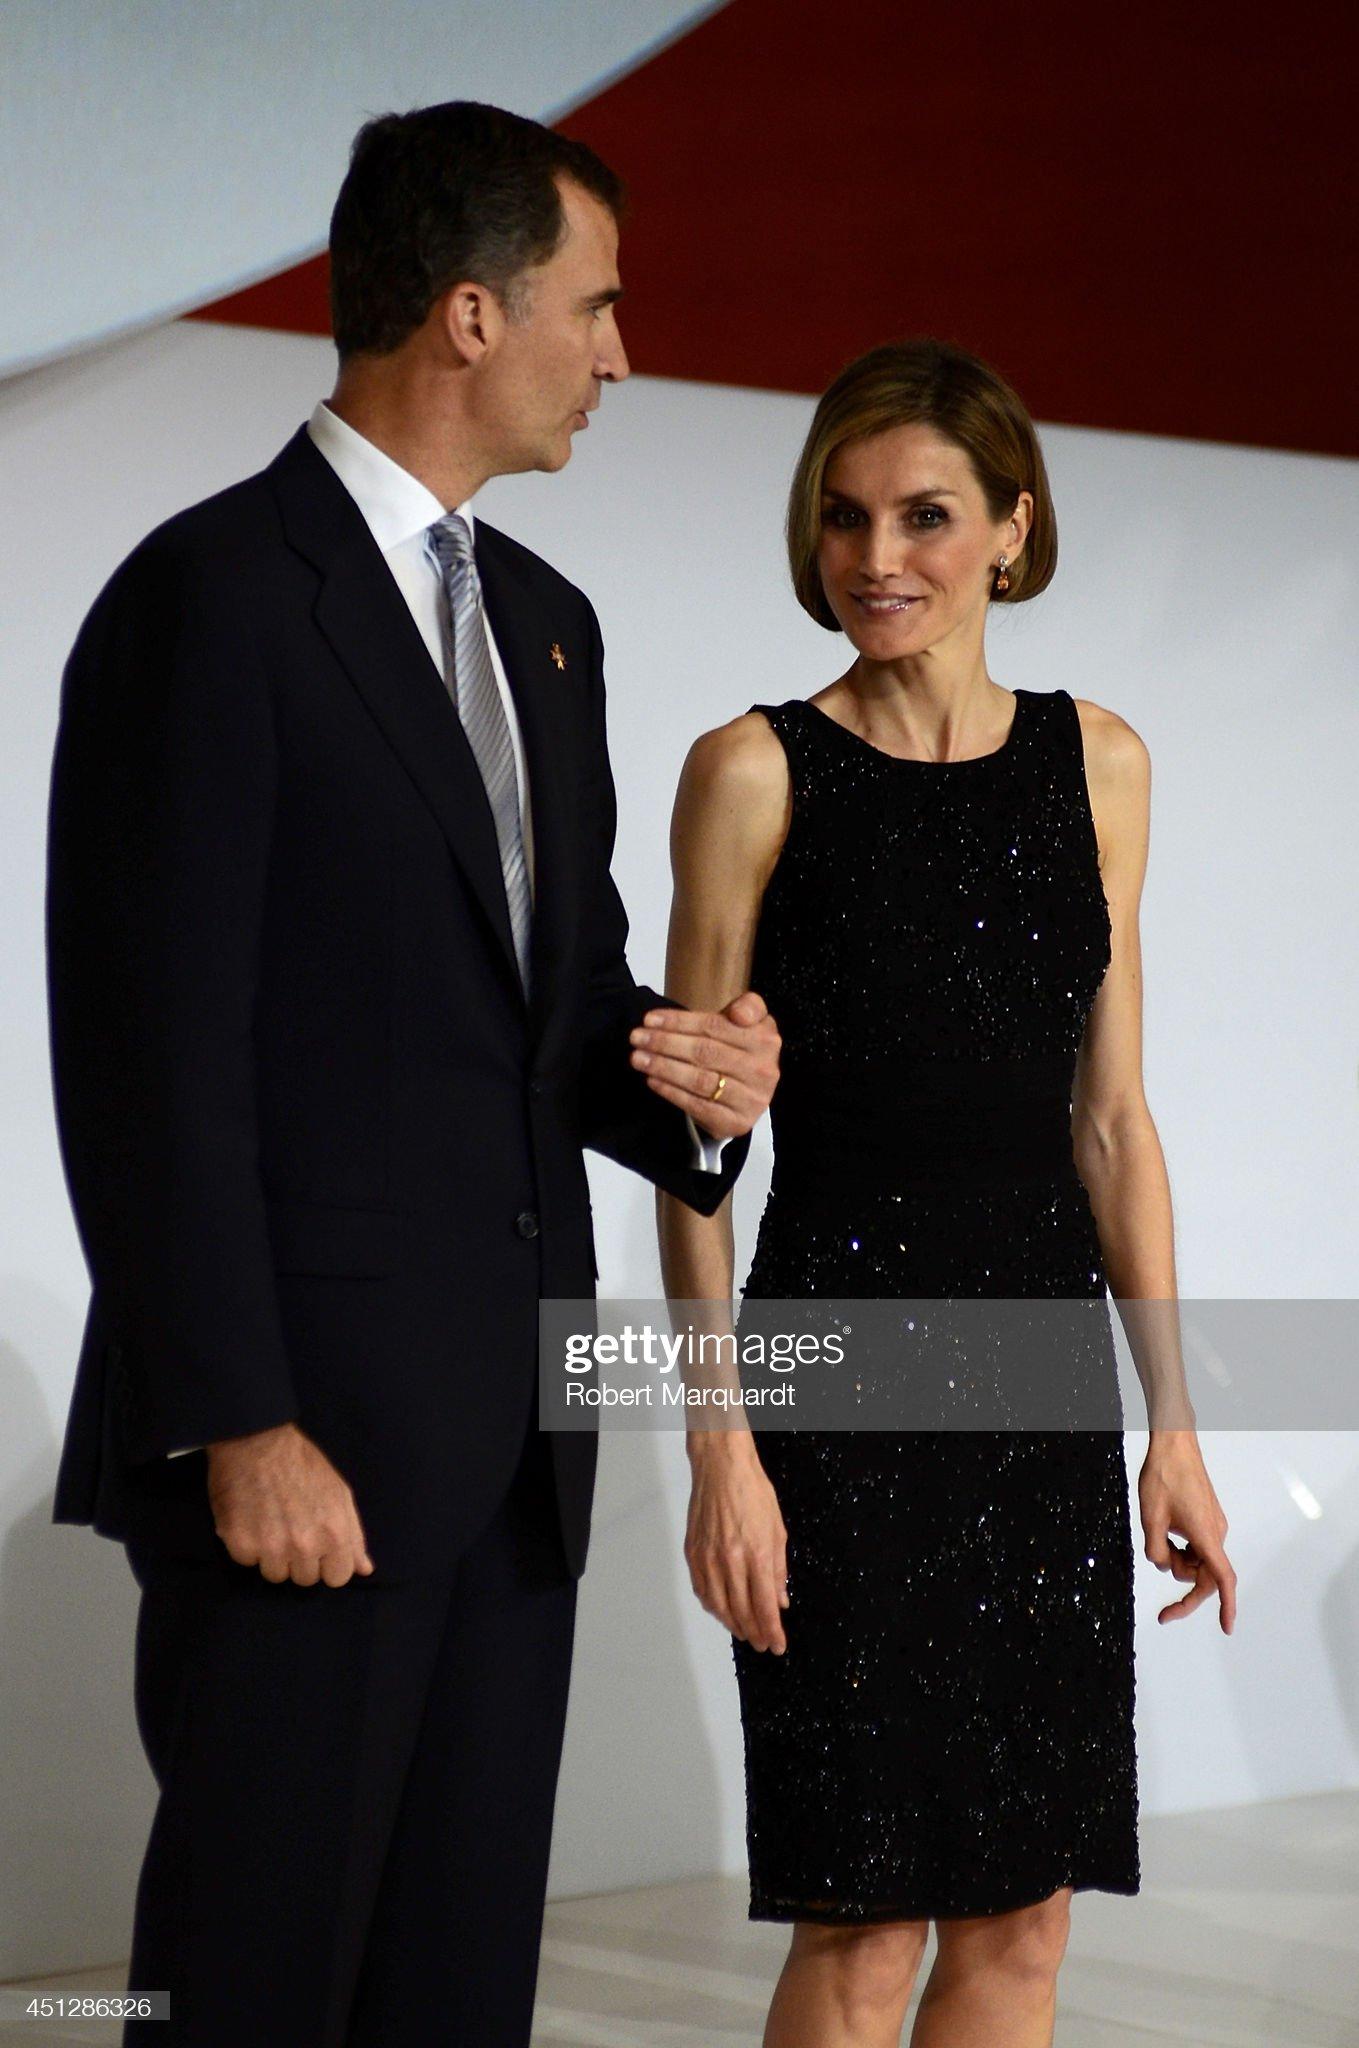 Spanish Royals Attend 'Principe de Girona' Foundation Awards : News Photo